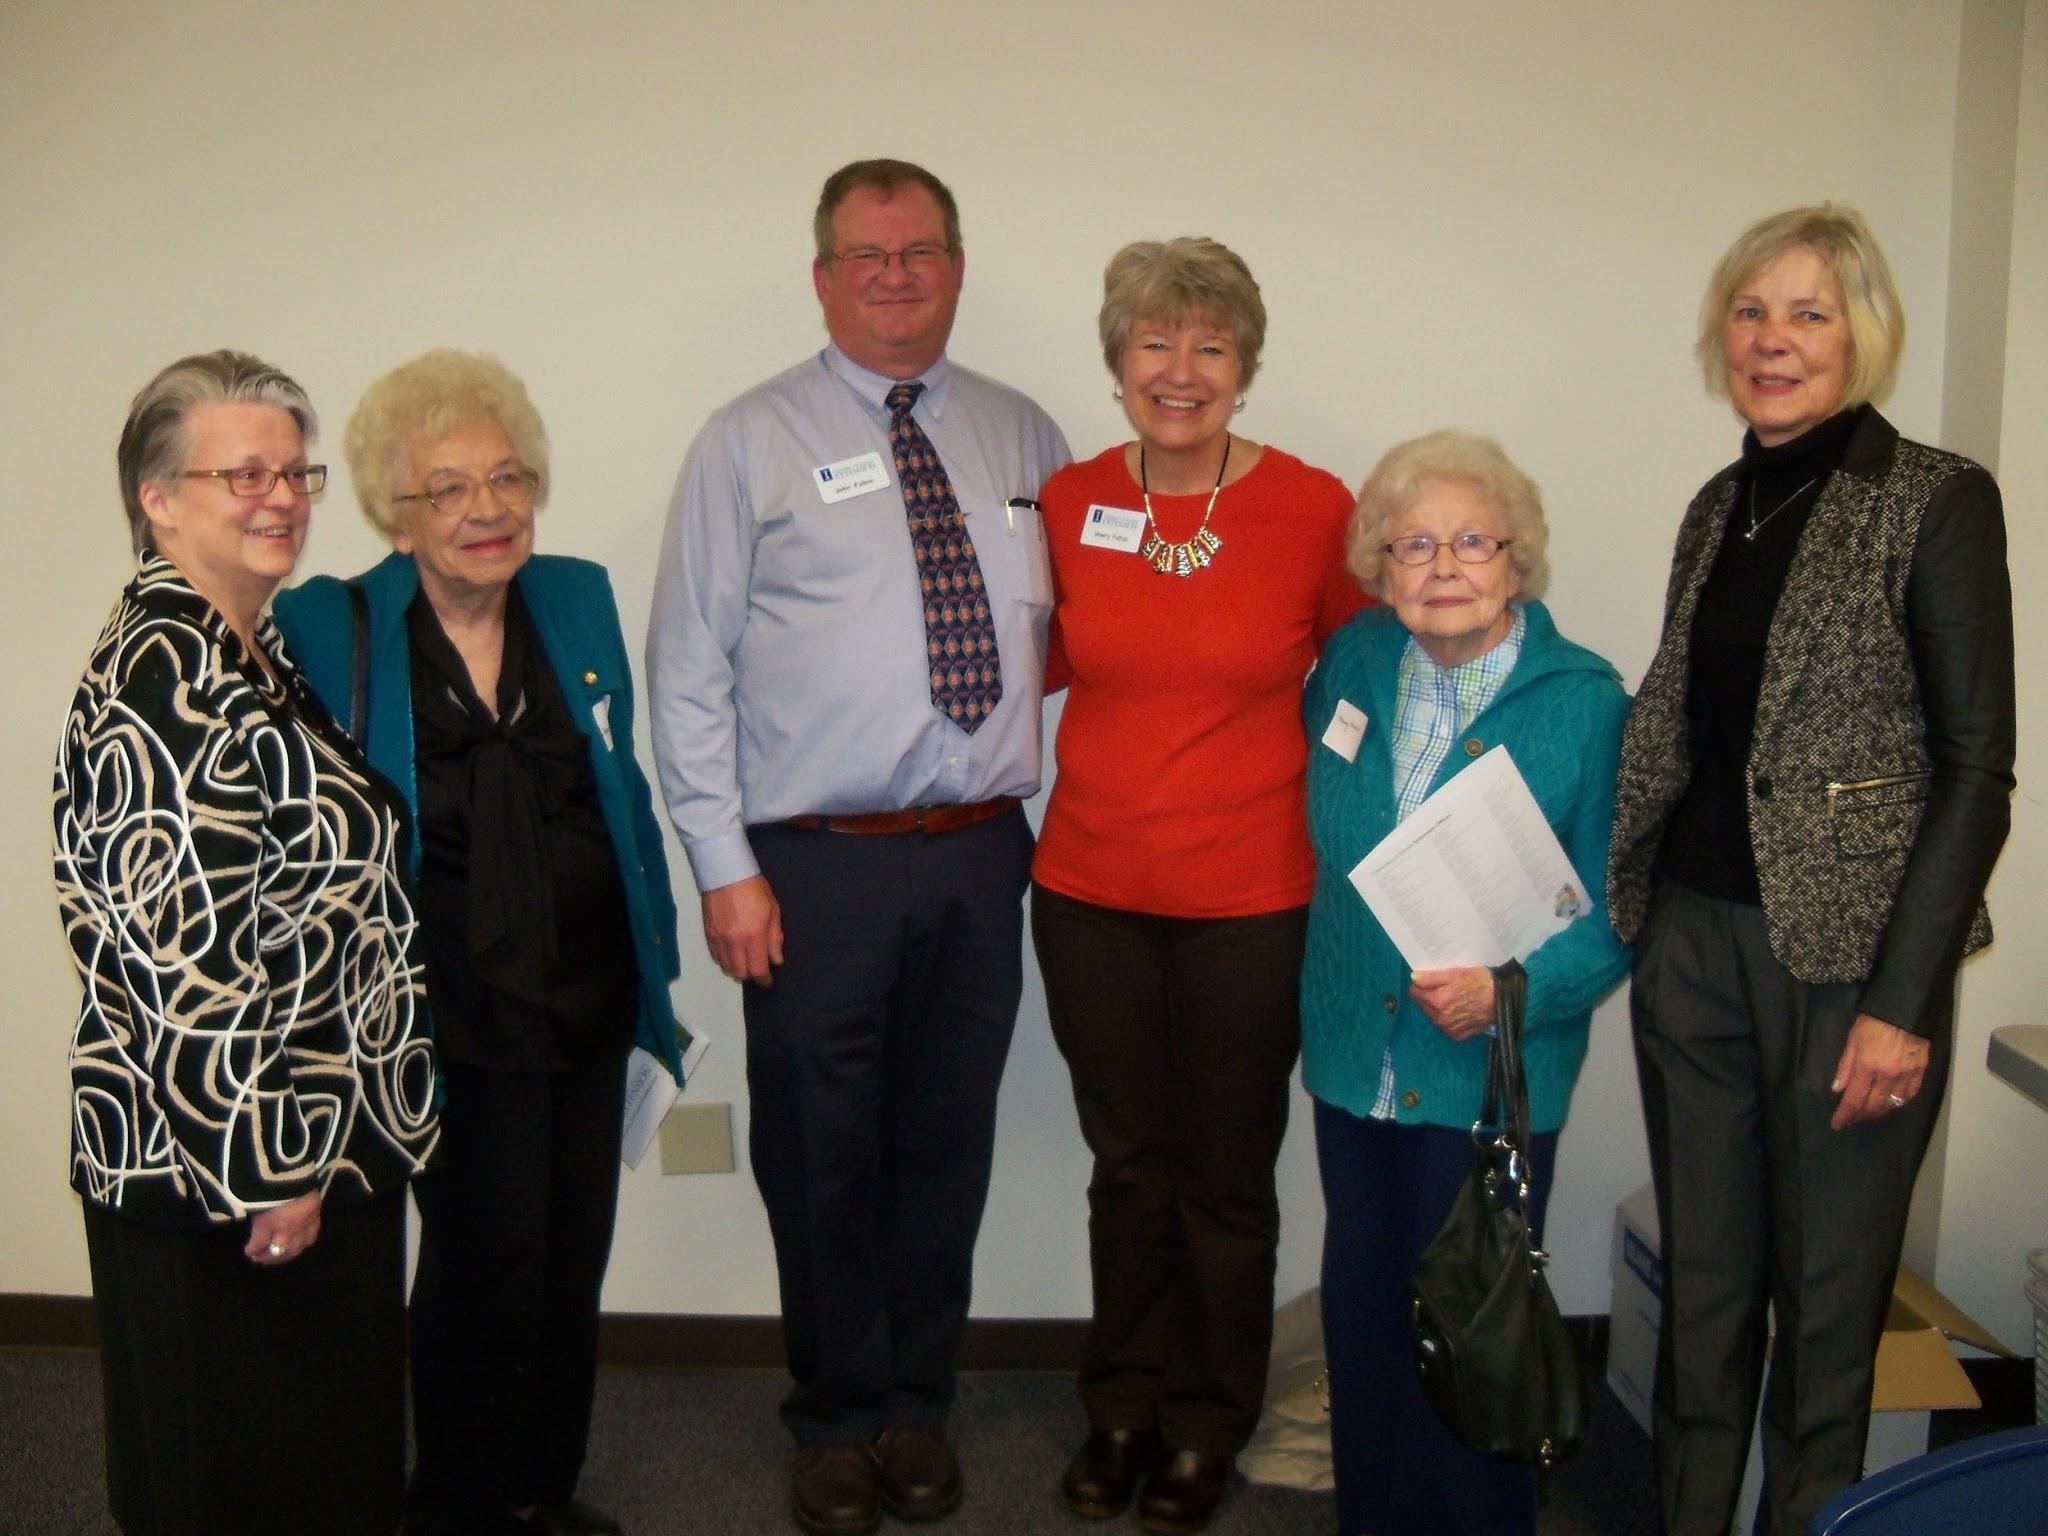 Jane Scherer, Marge Sohn, John Fulton, Sherry Fulton, Marge Mead, & Nancy King.